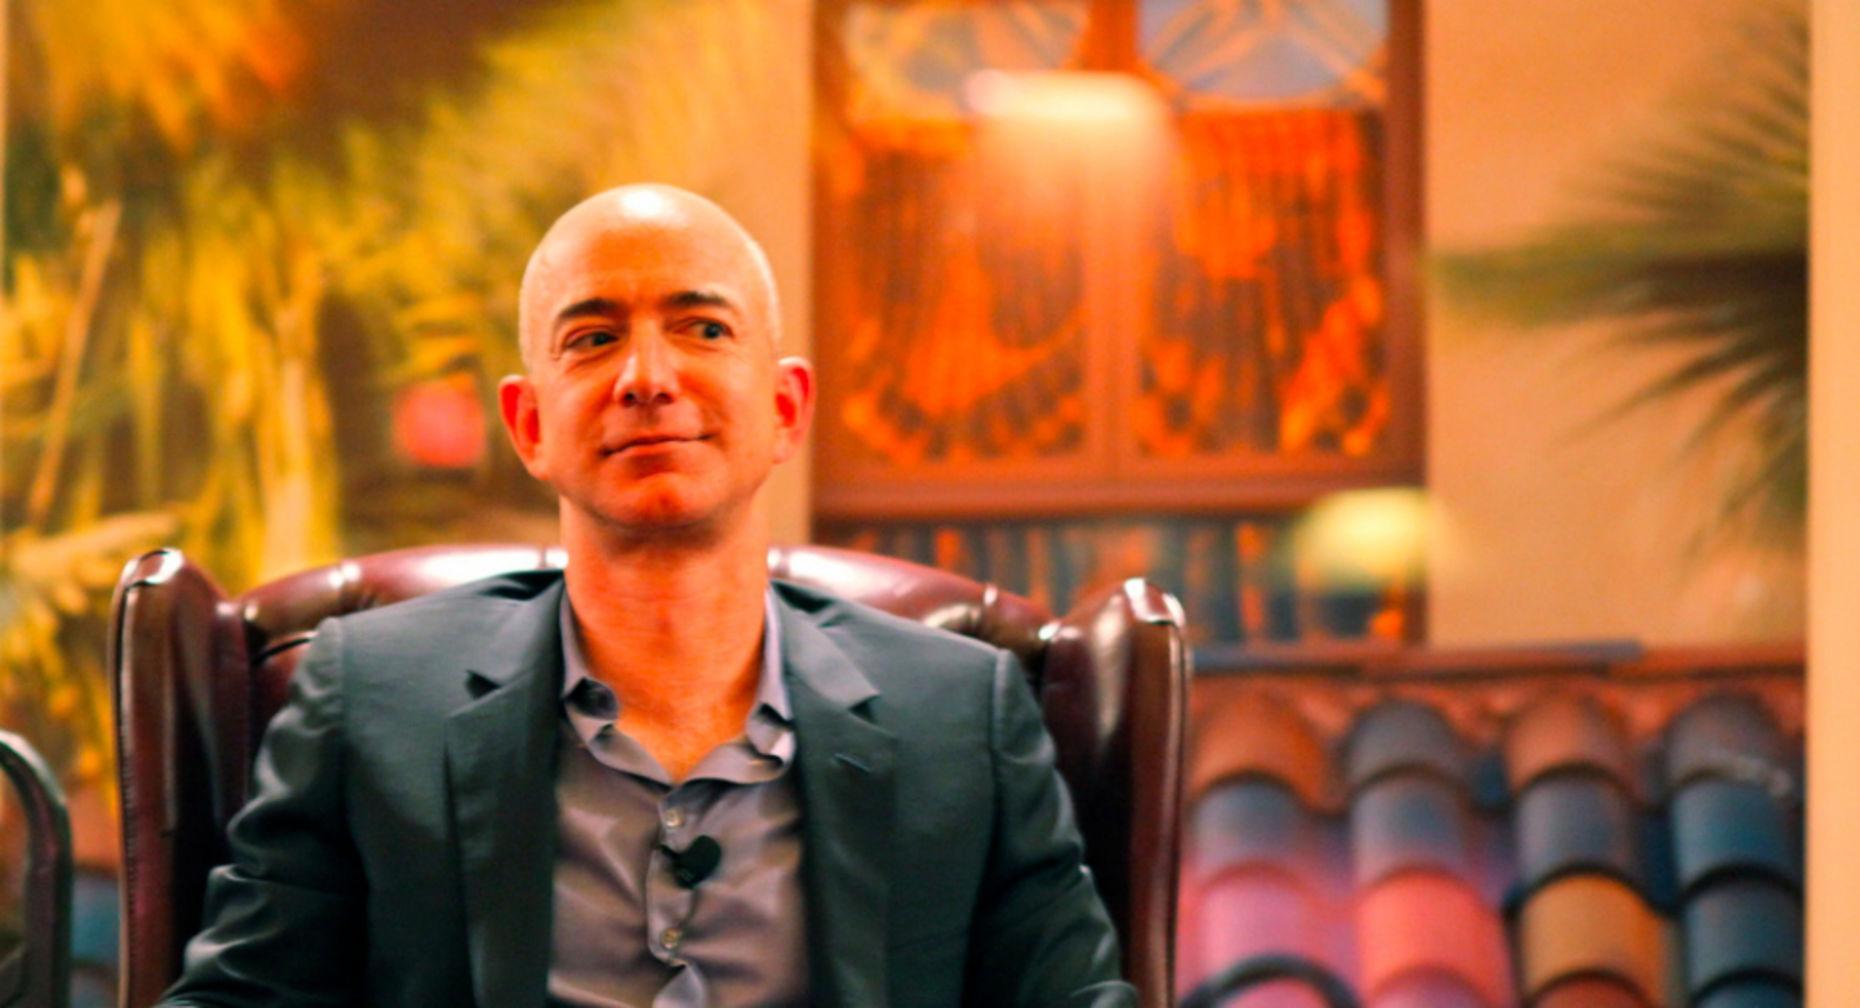 Jeff Bezos. Credit:  Steve Jurvetson via Flickr